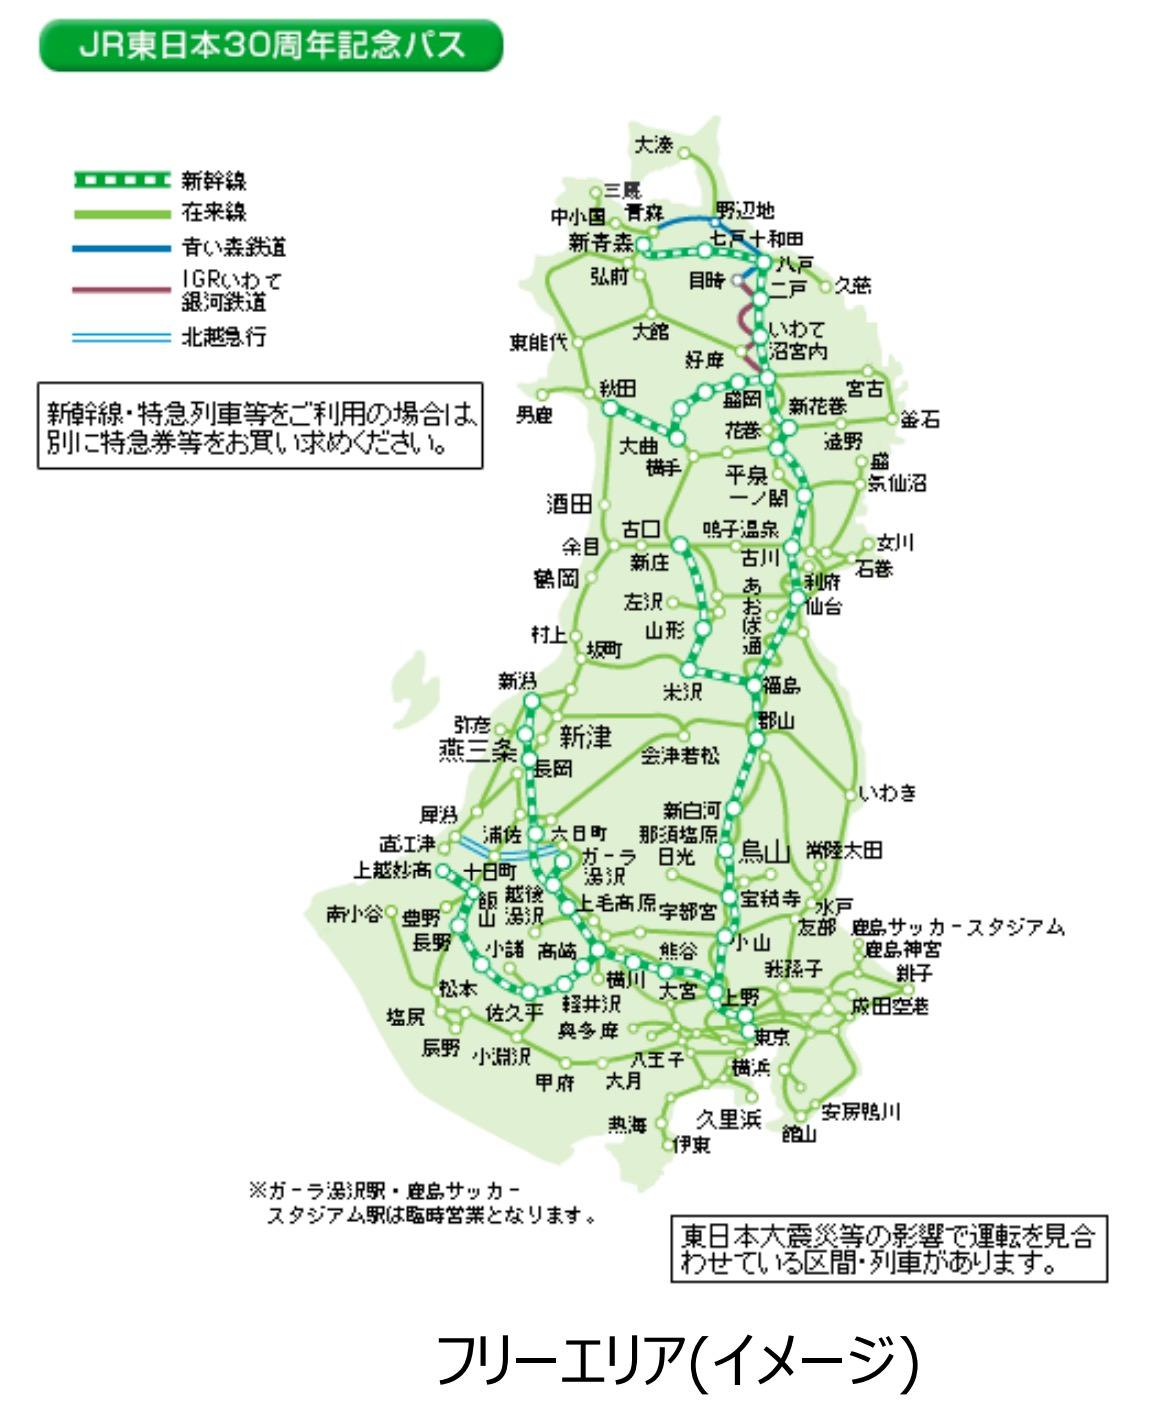 JR東日本全線が3日間乗り放題になる「JR東日本 30周年記念パス」発売